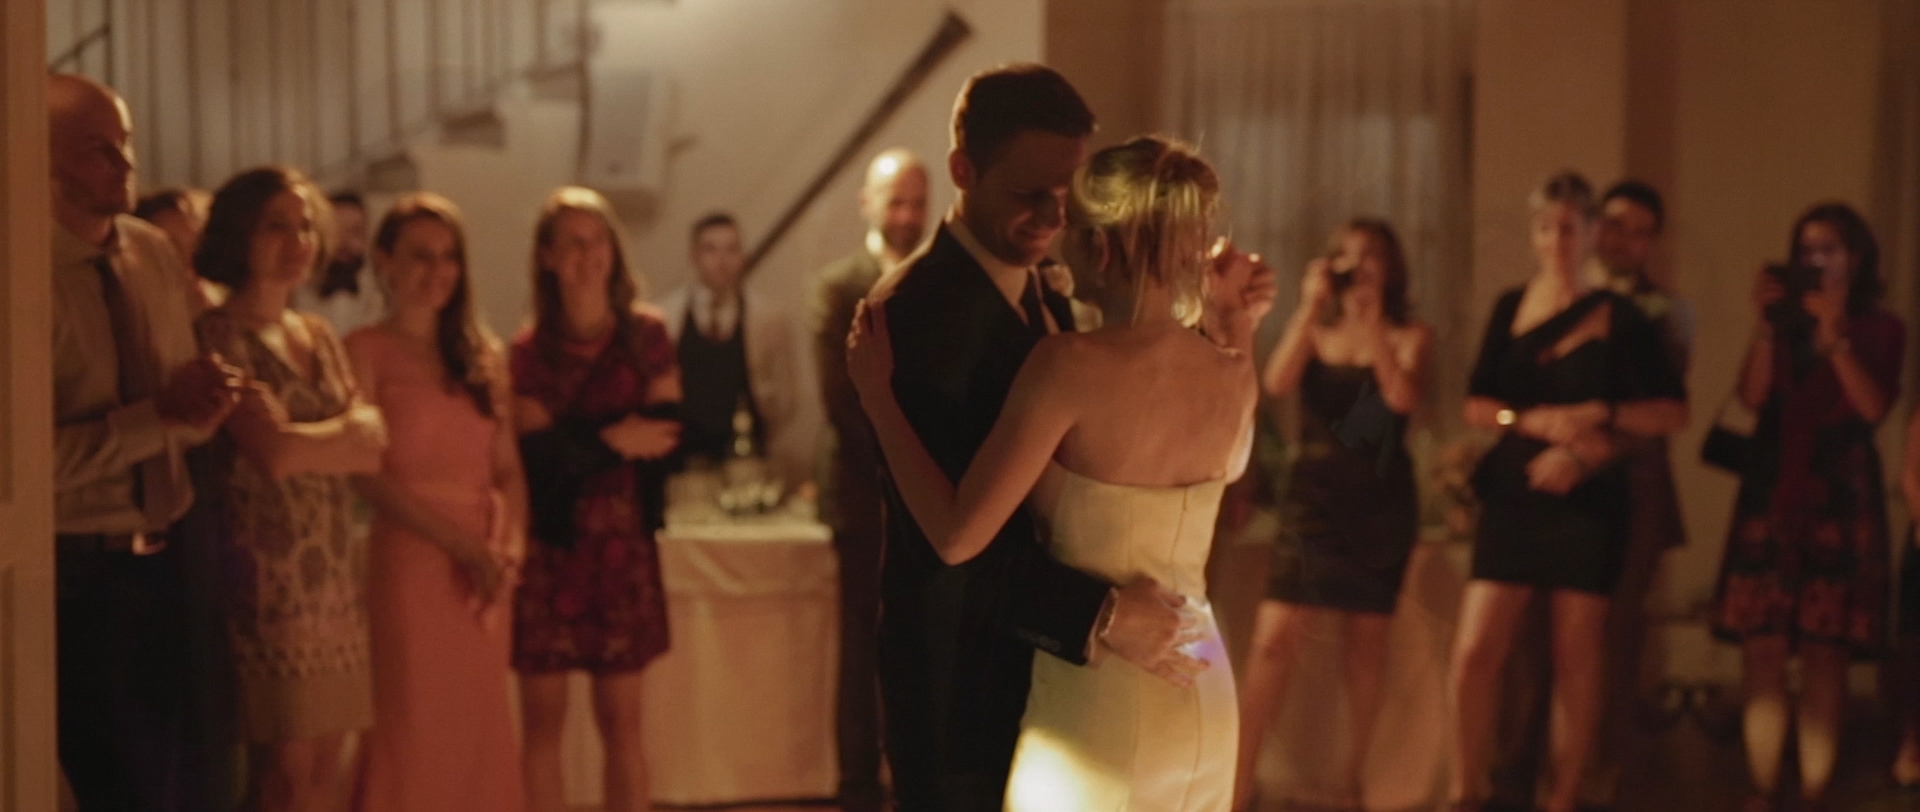 Frederic & Valentina | Trailer (Eng) 1